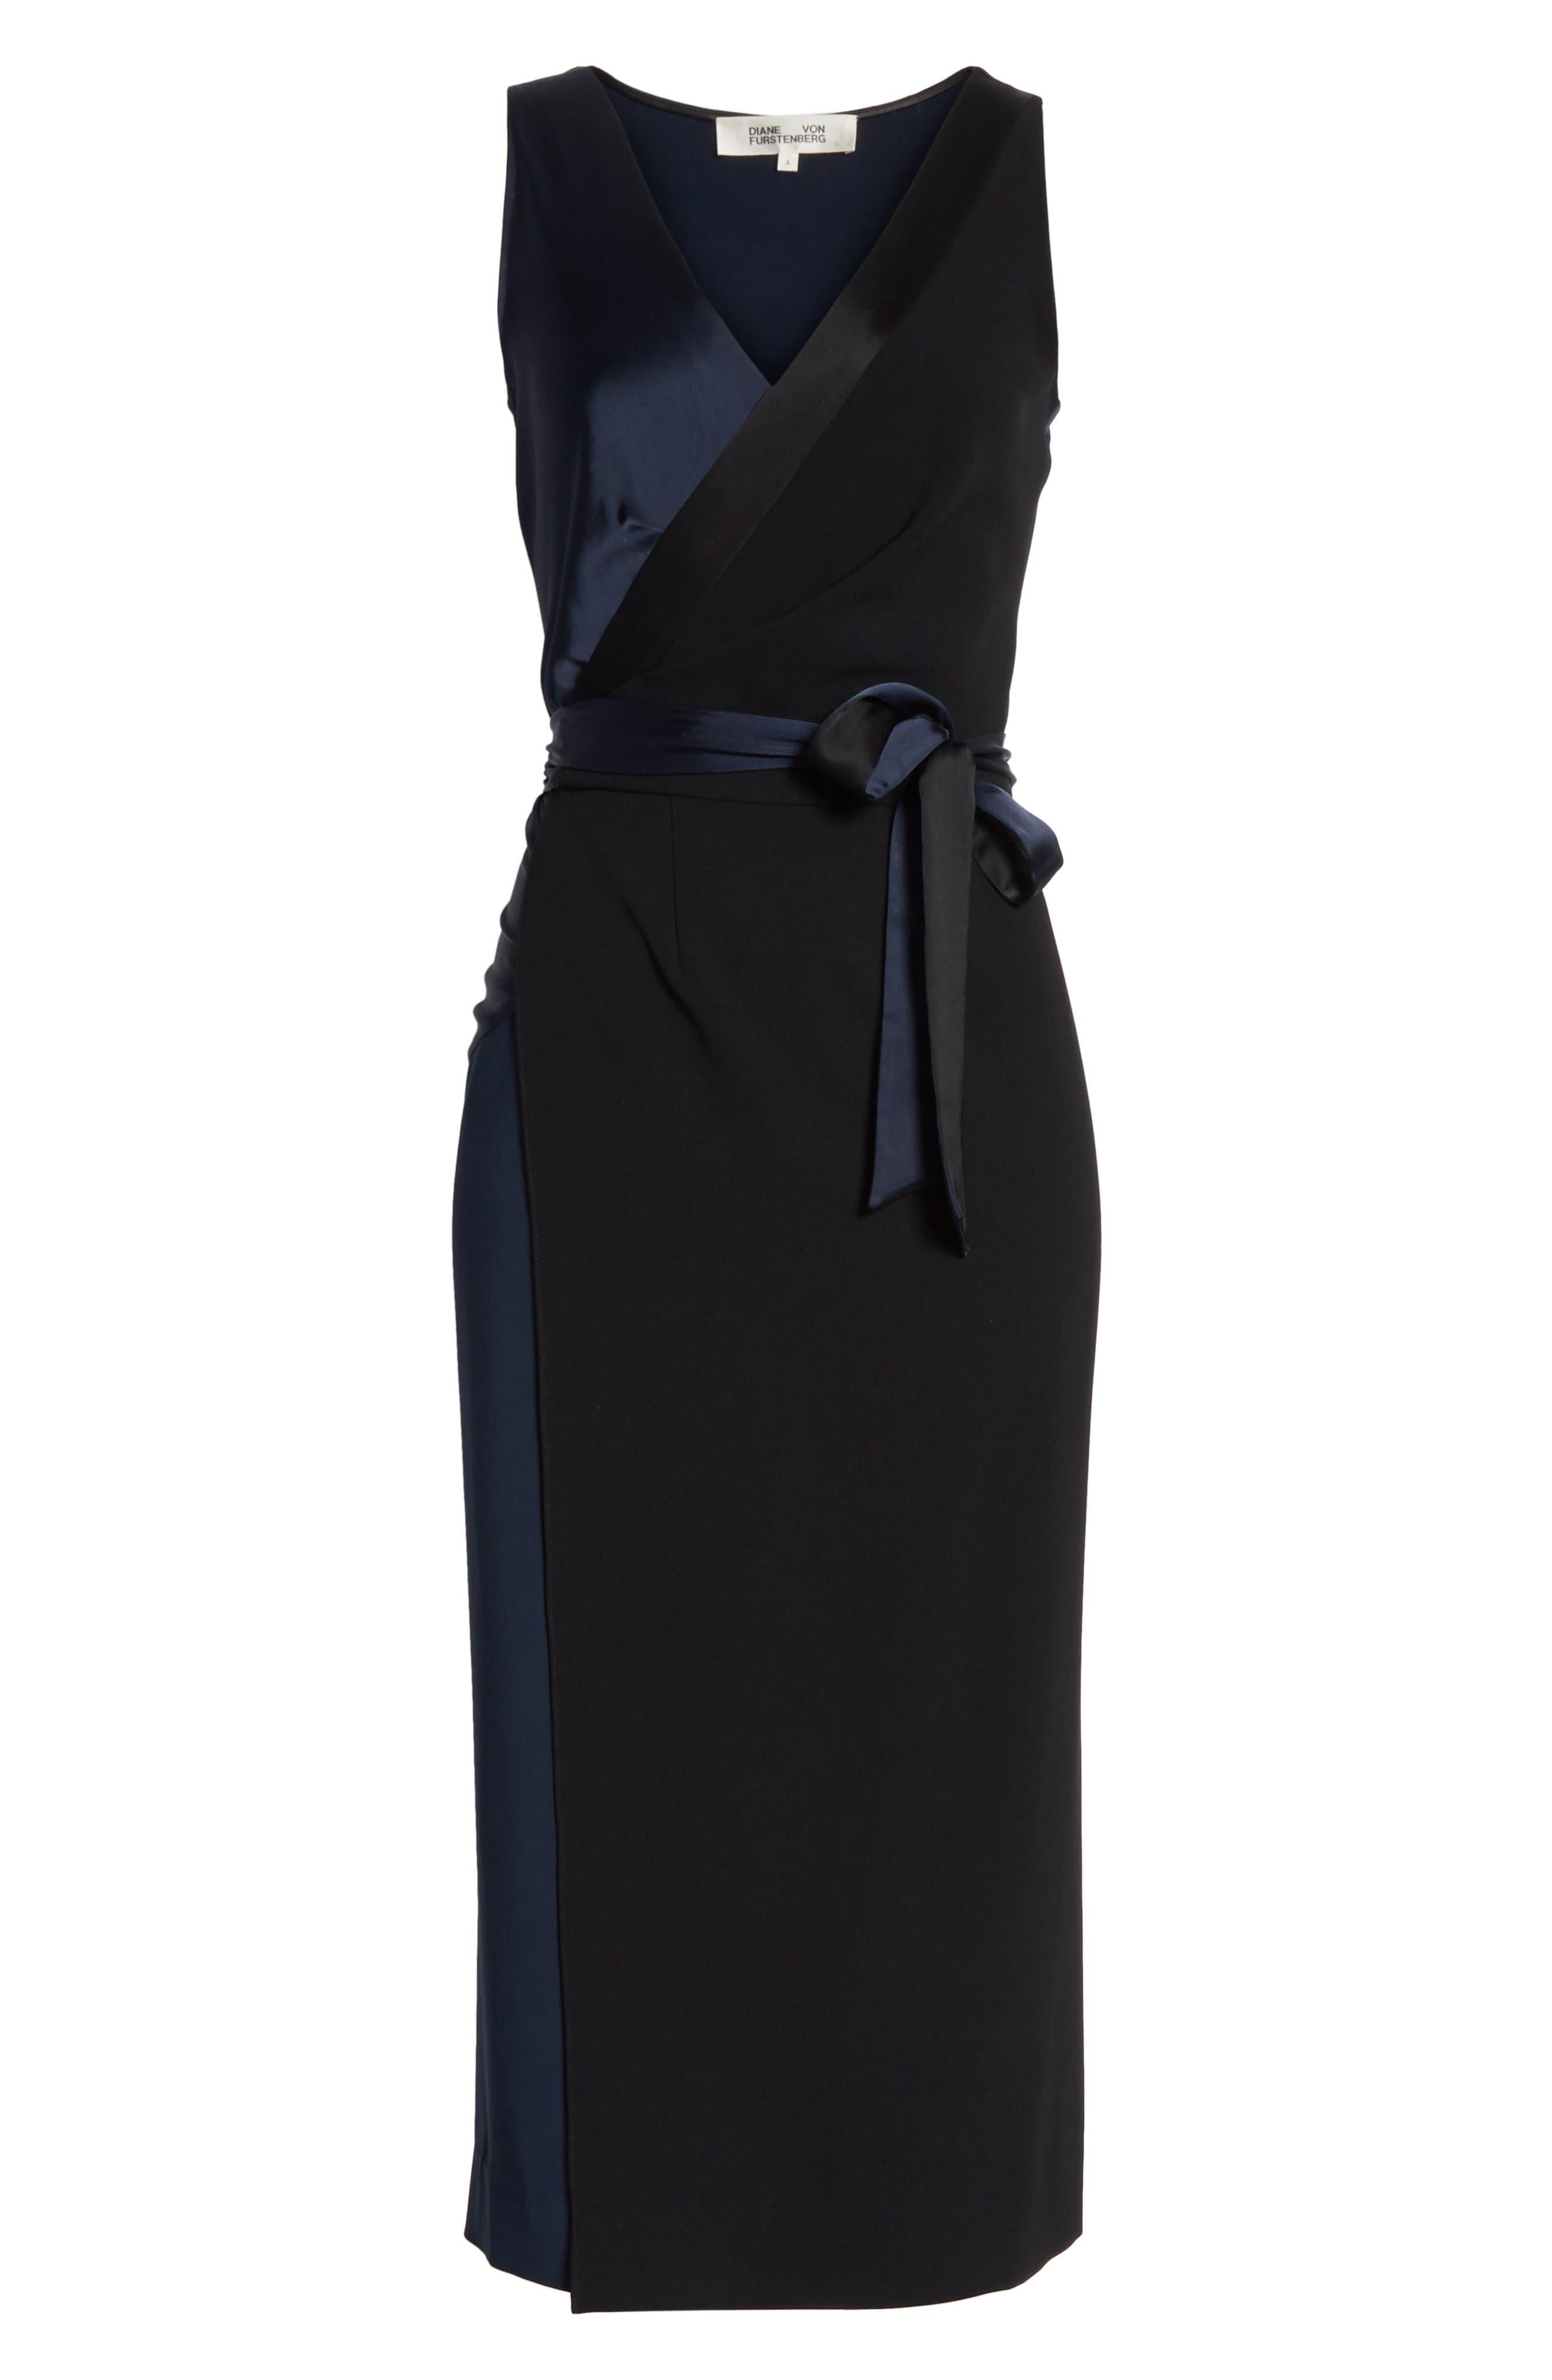 Midi Wrap Dress,                             Alternate thumbnail 6, color,                             Alexander Navy/ Black